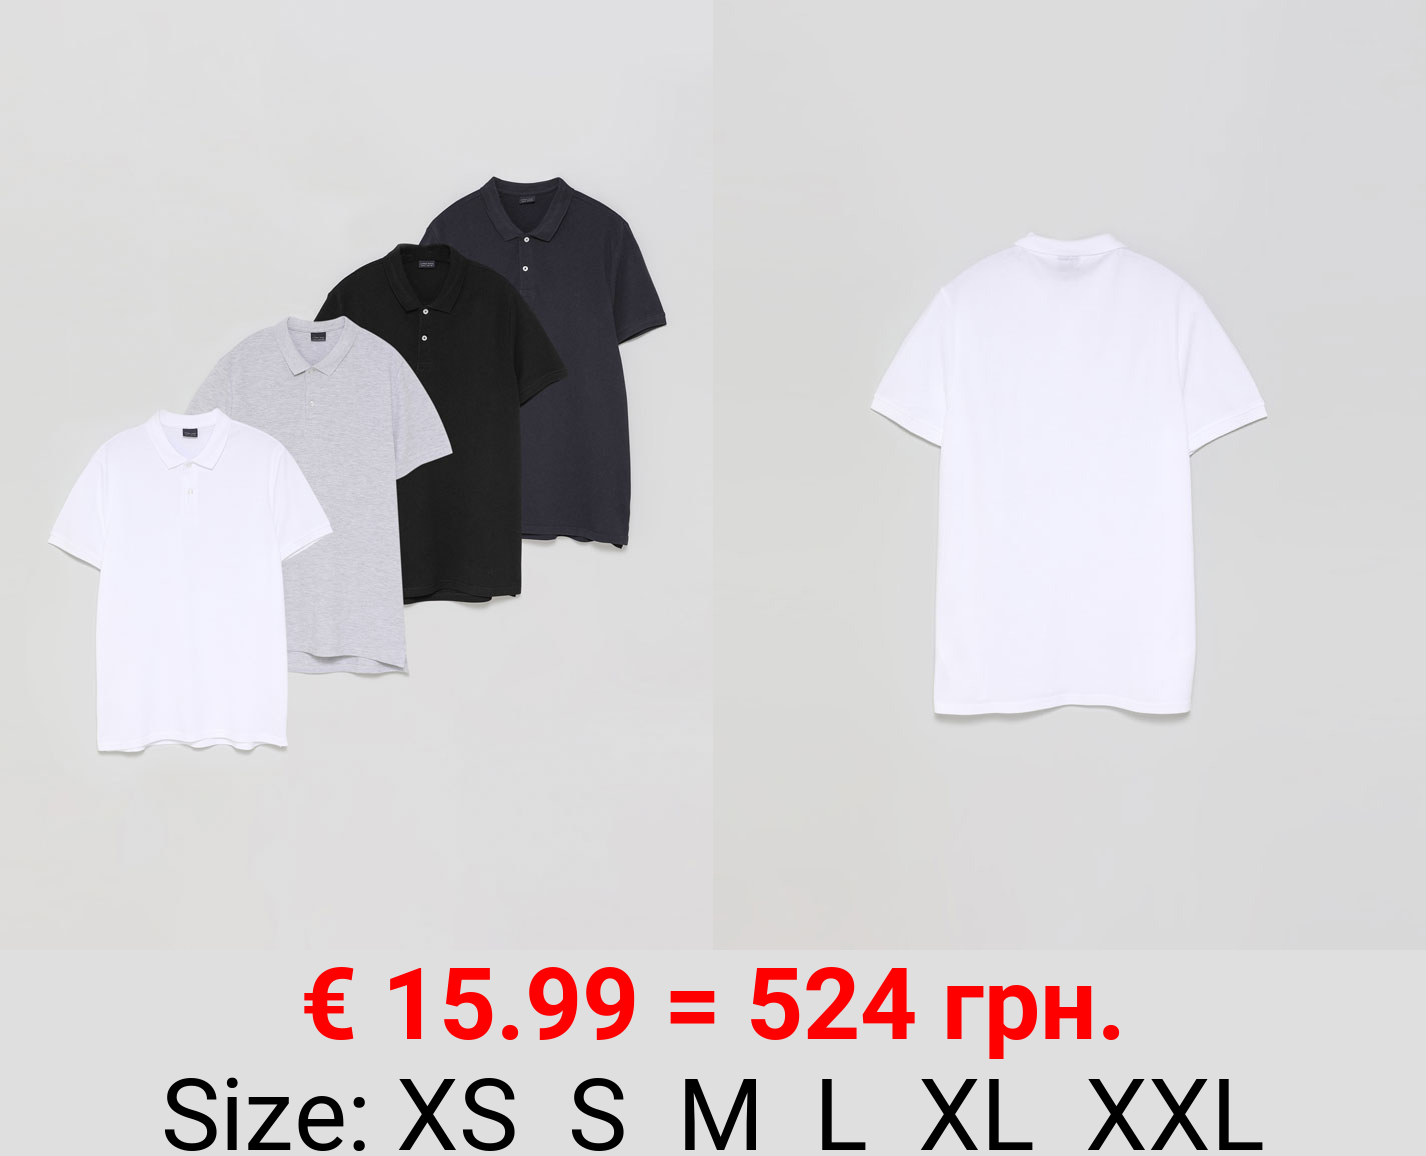 4-Pack of basic polo shirts